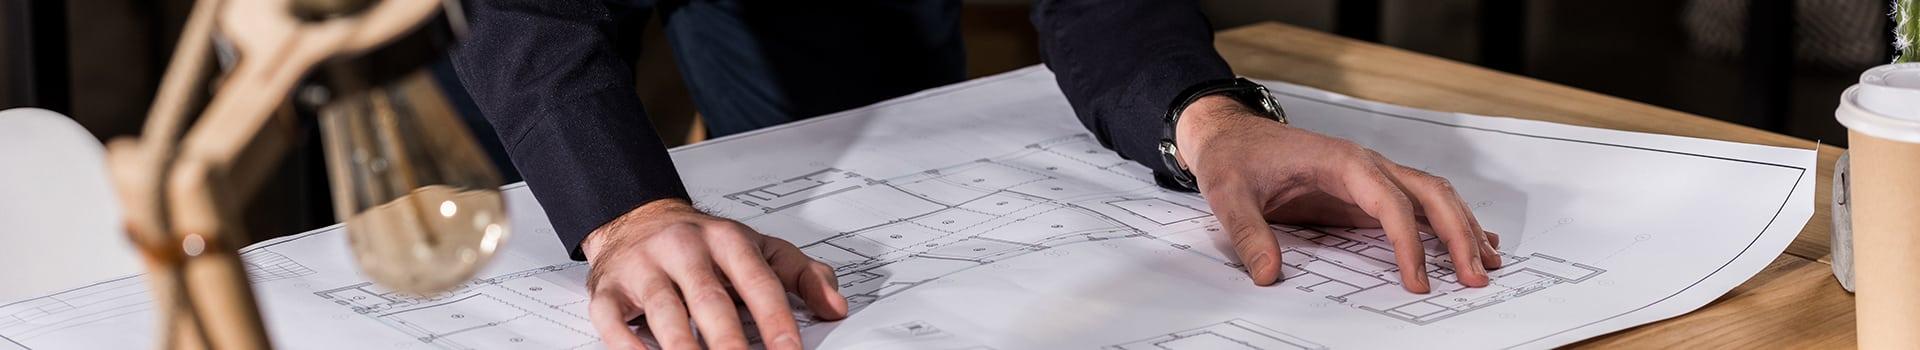 Lemmens Tegels | Keramische tegels - architect